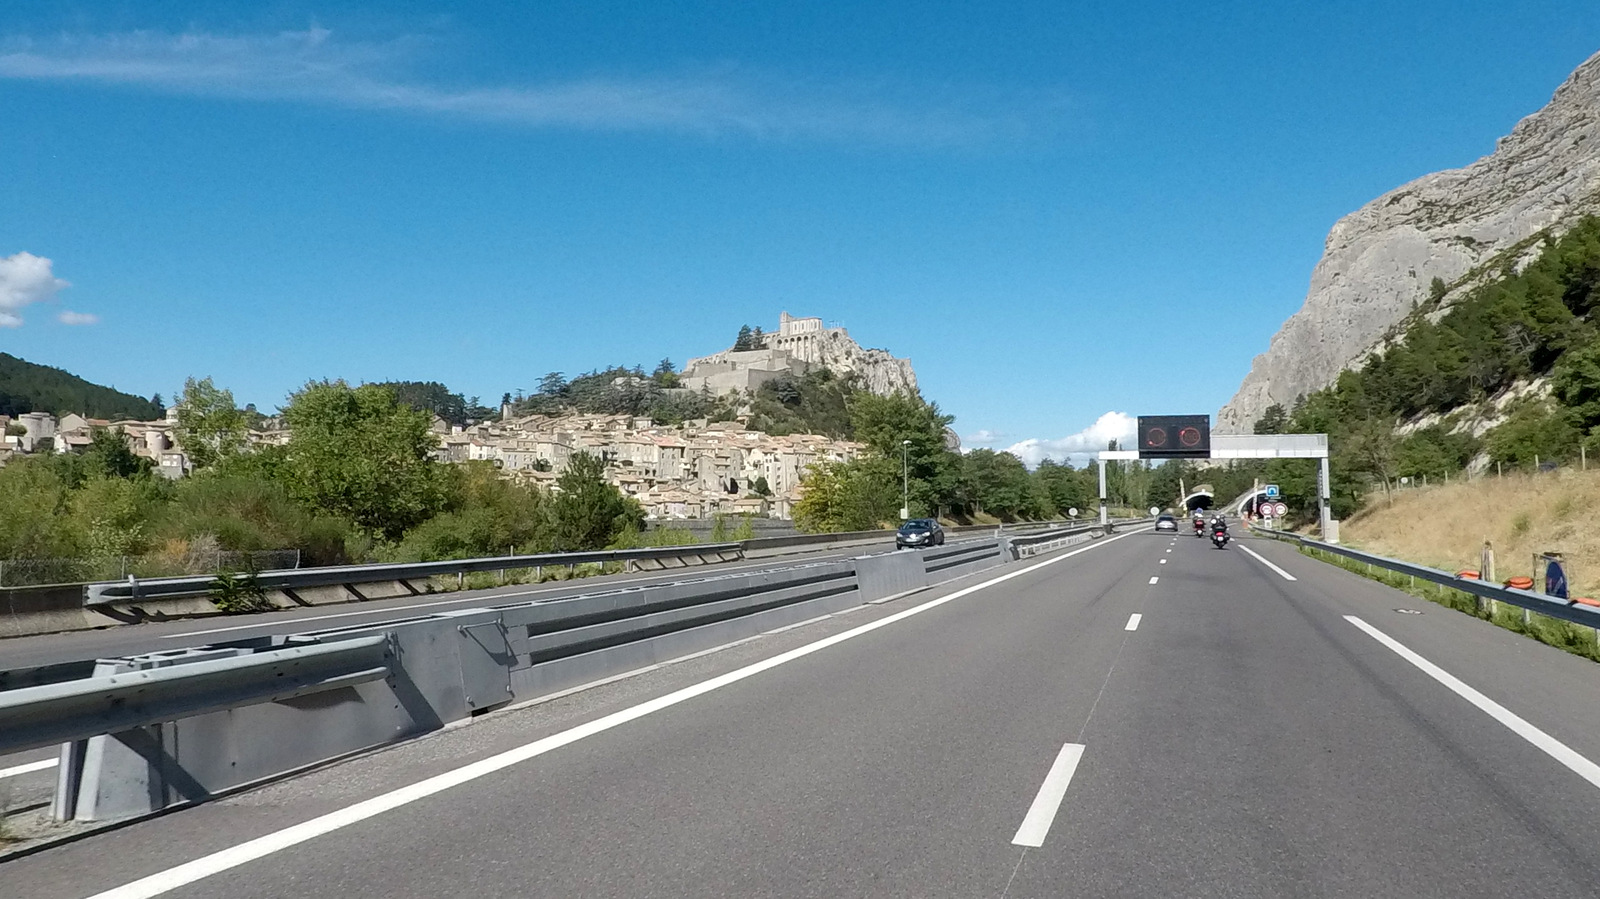 ... jusqu'à Sisteron